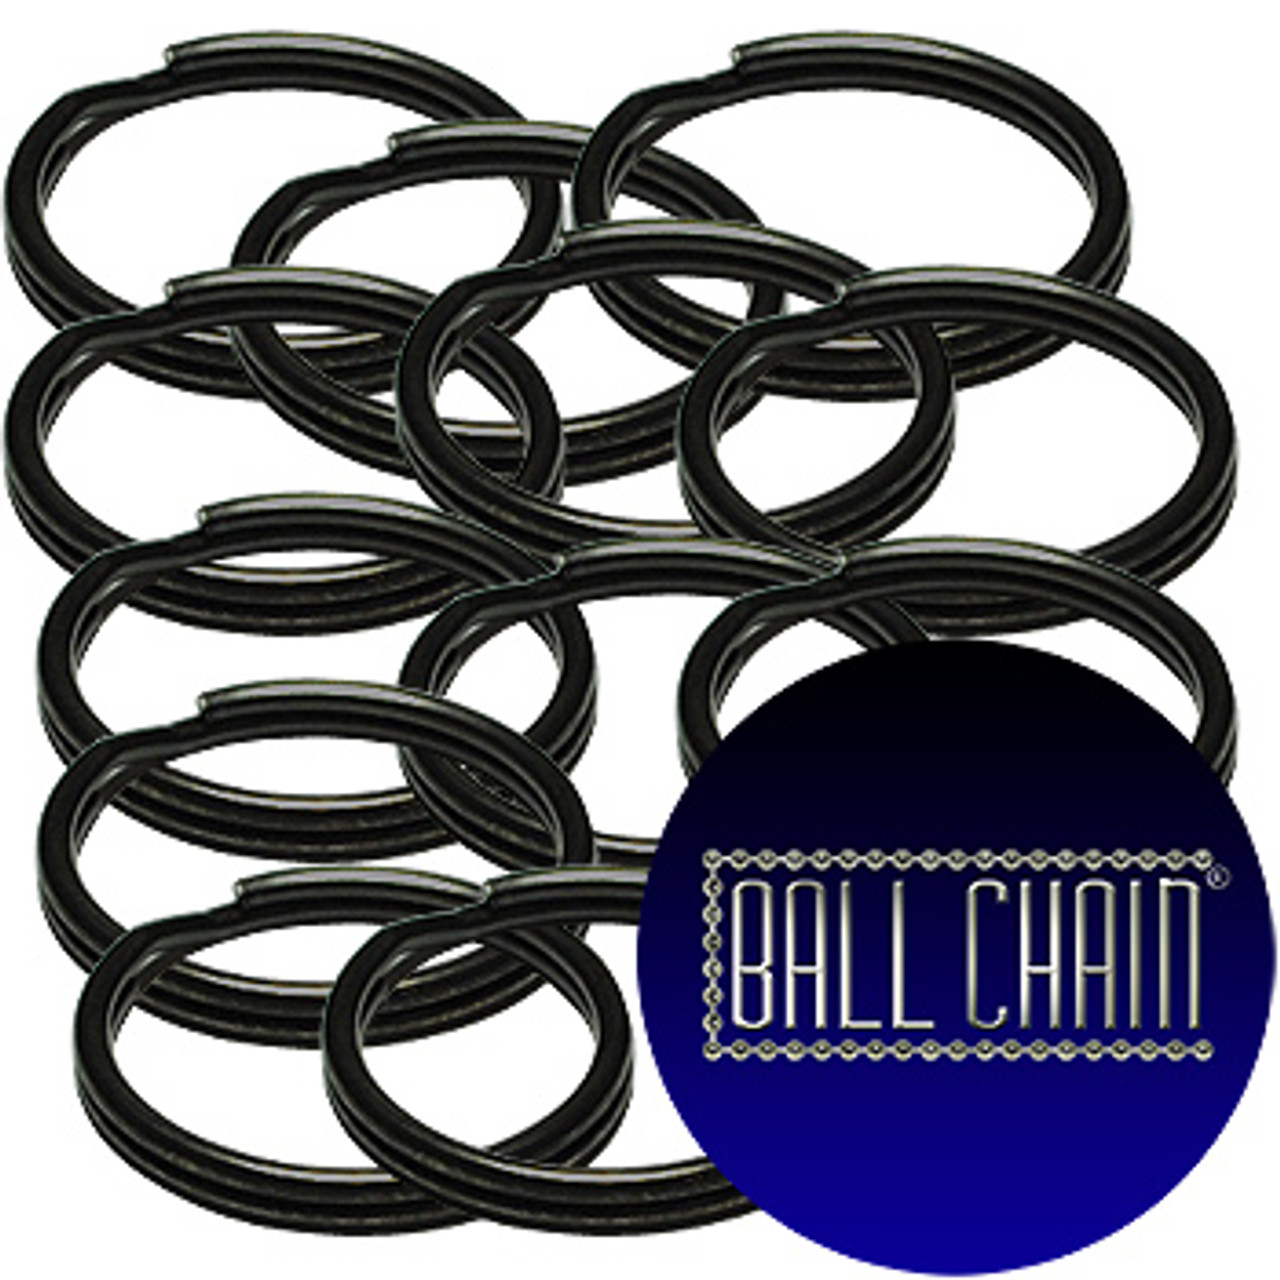 28mm (1 Inch) Black Split Key Rings